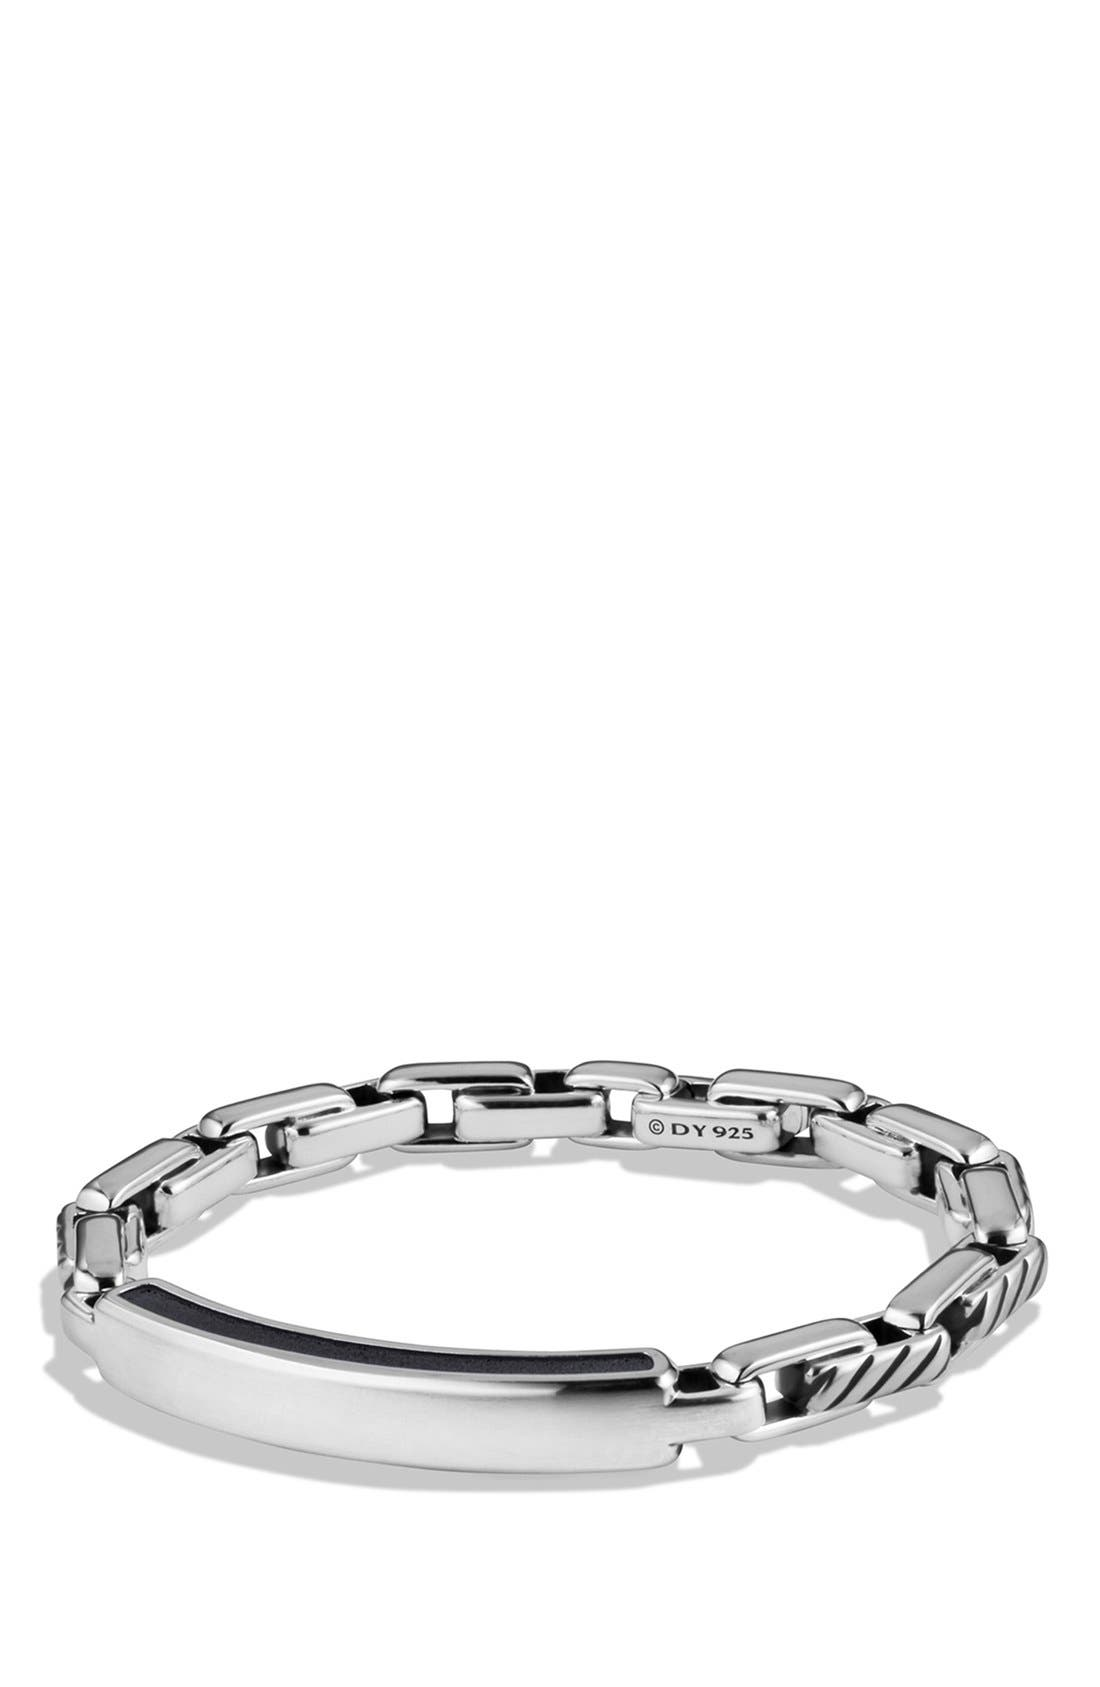 David Yurman 'Modern Cable' ID Bracelet